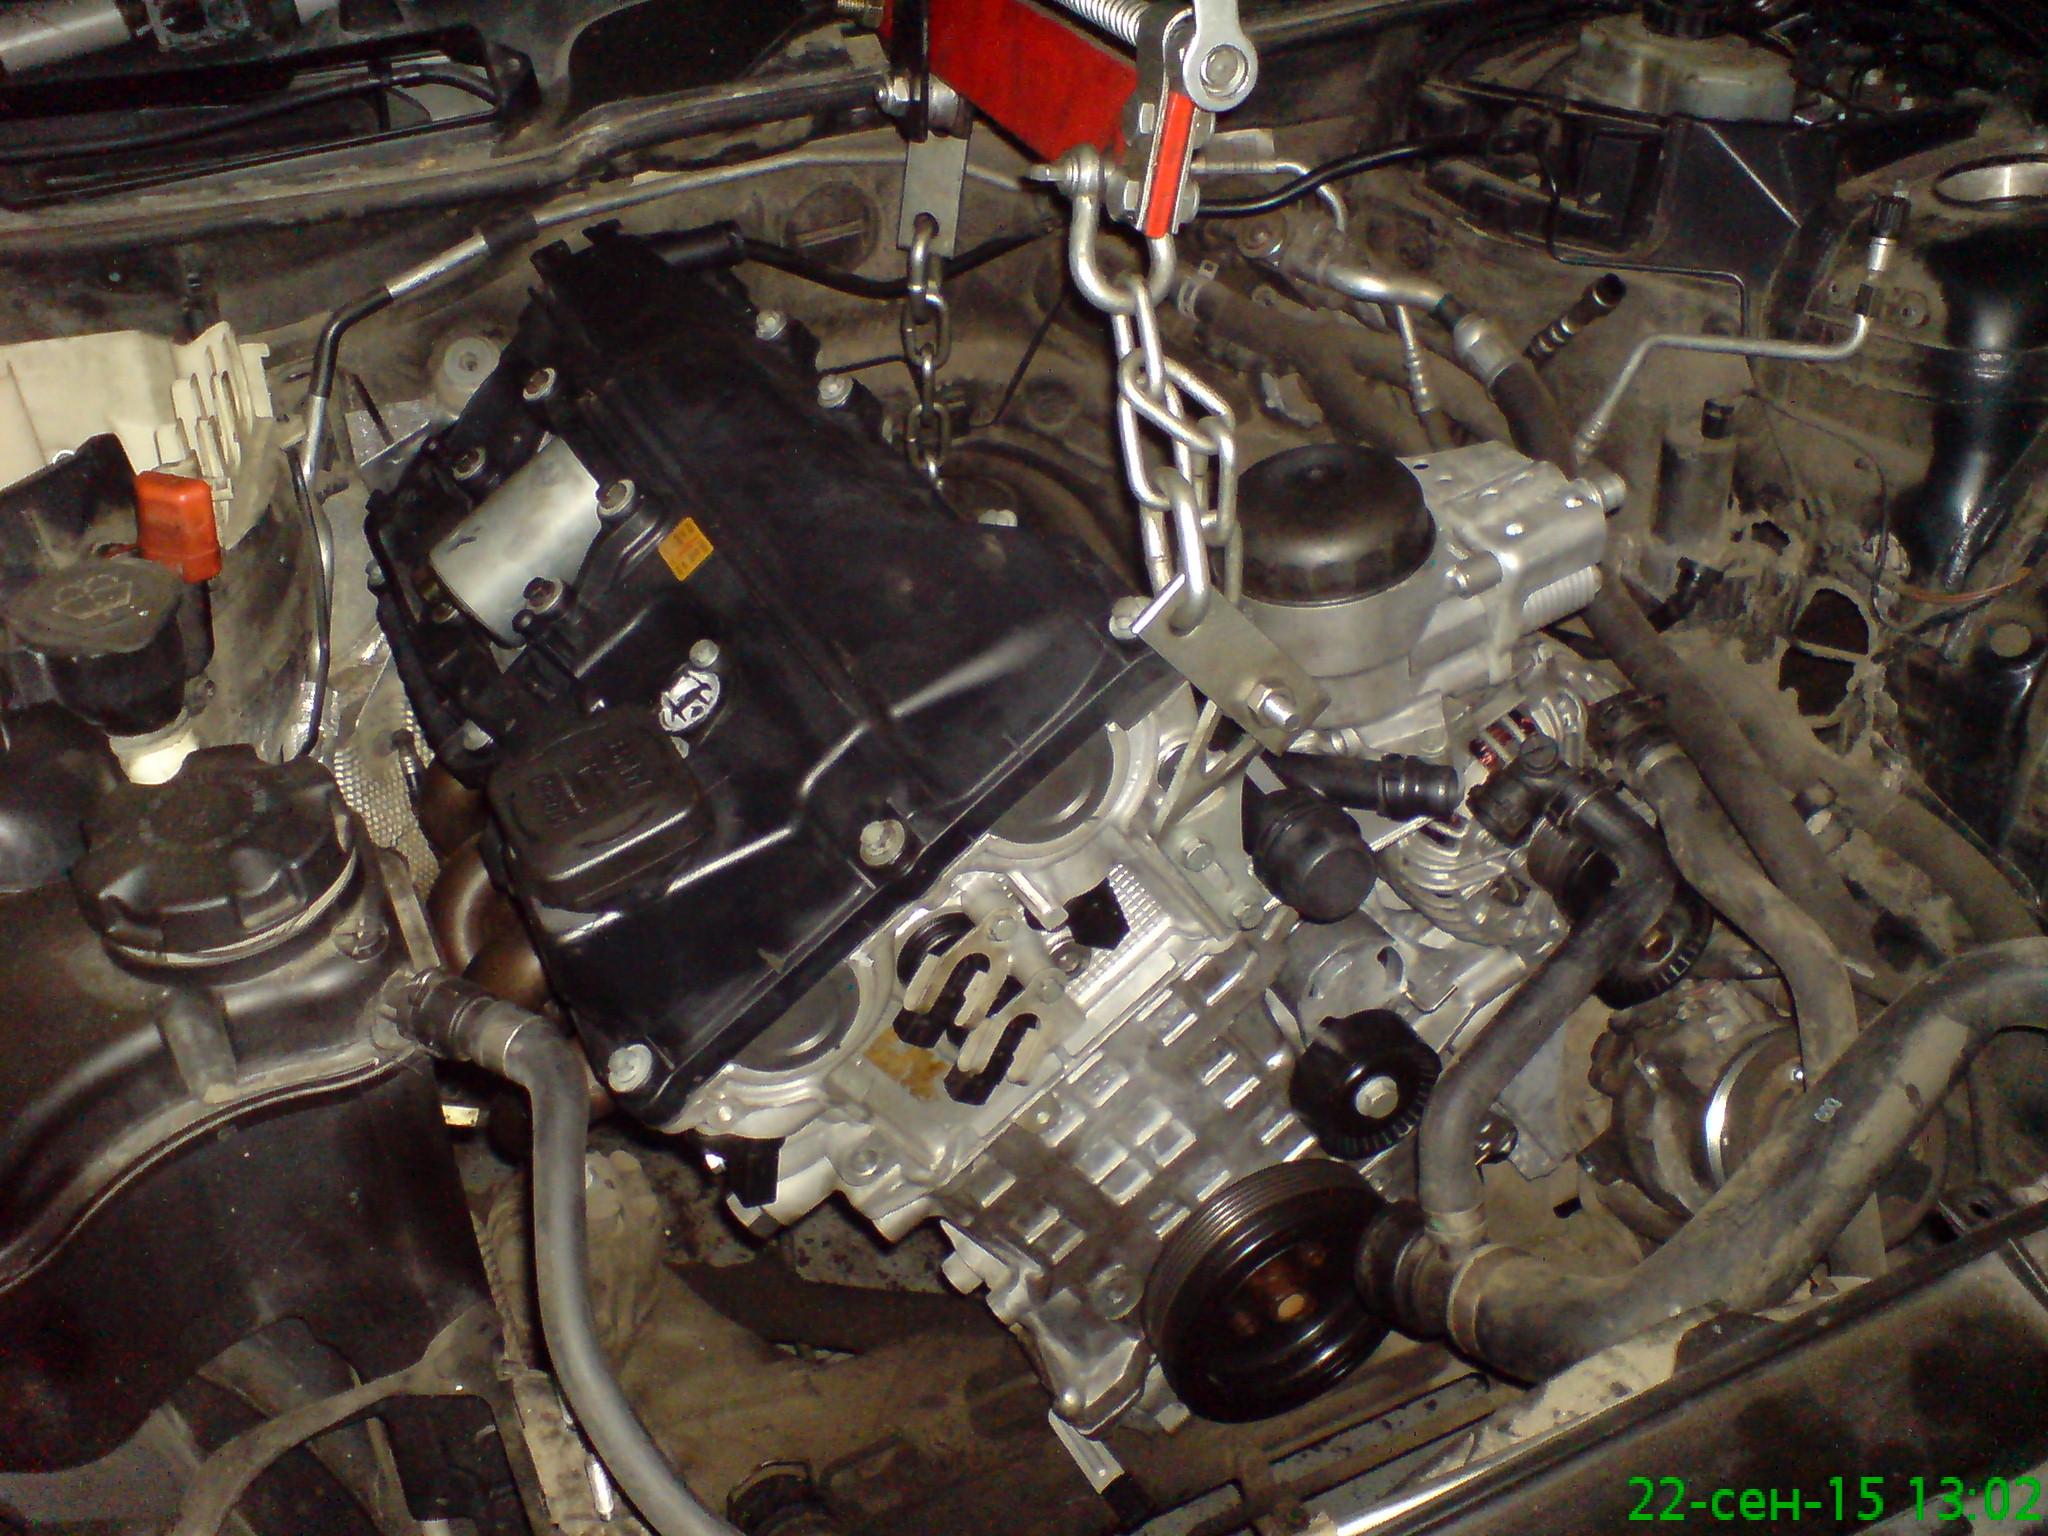 Ремонт двигателей BMW N42 /46 / 46T на СТО в Киеве